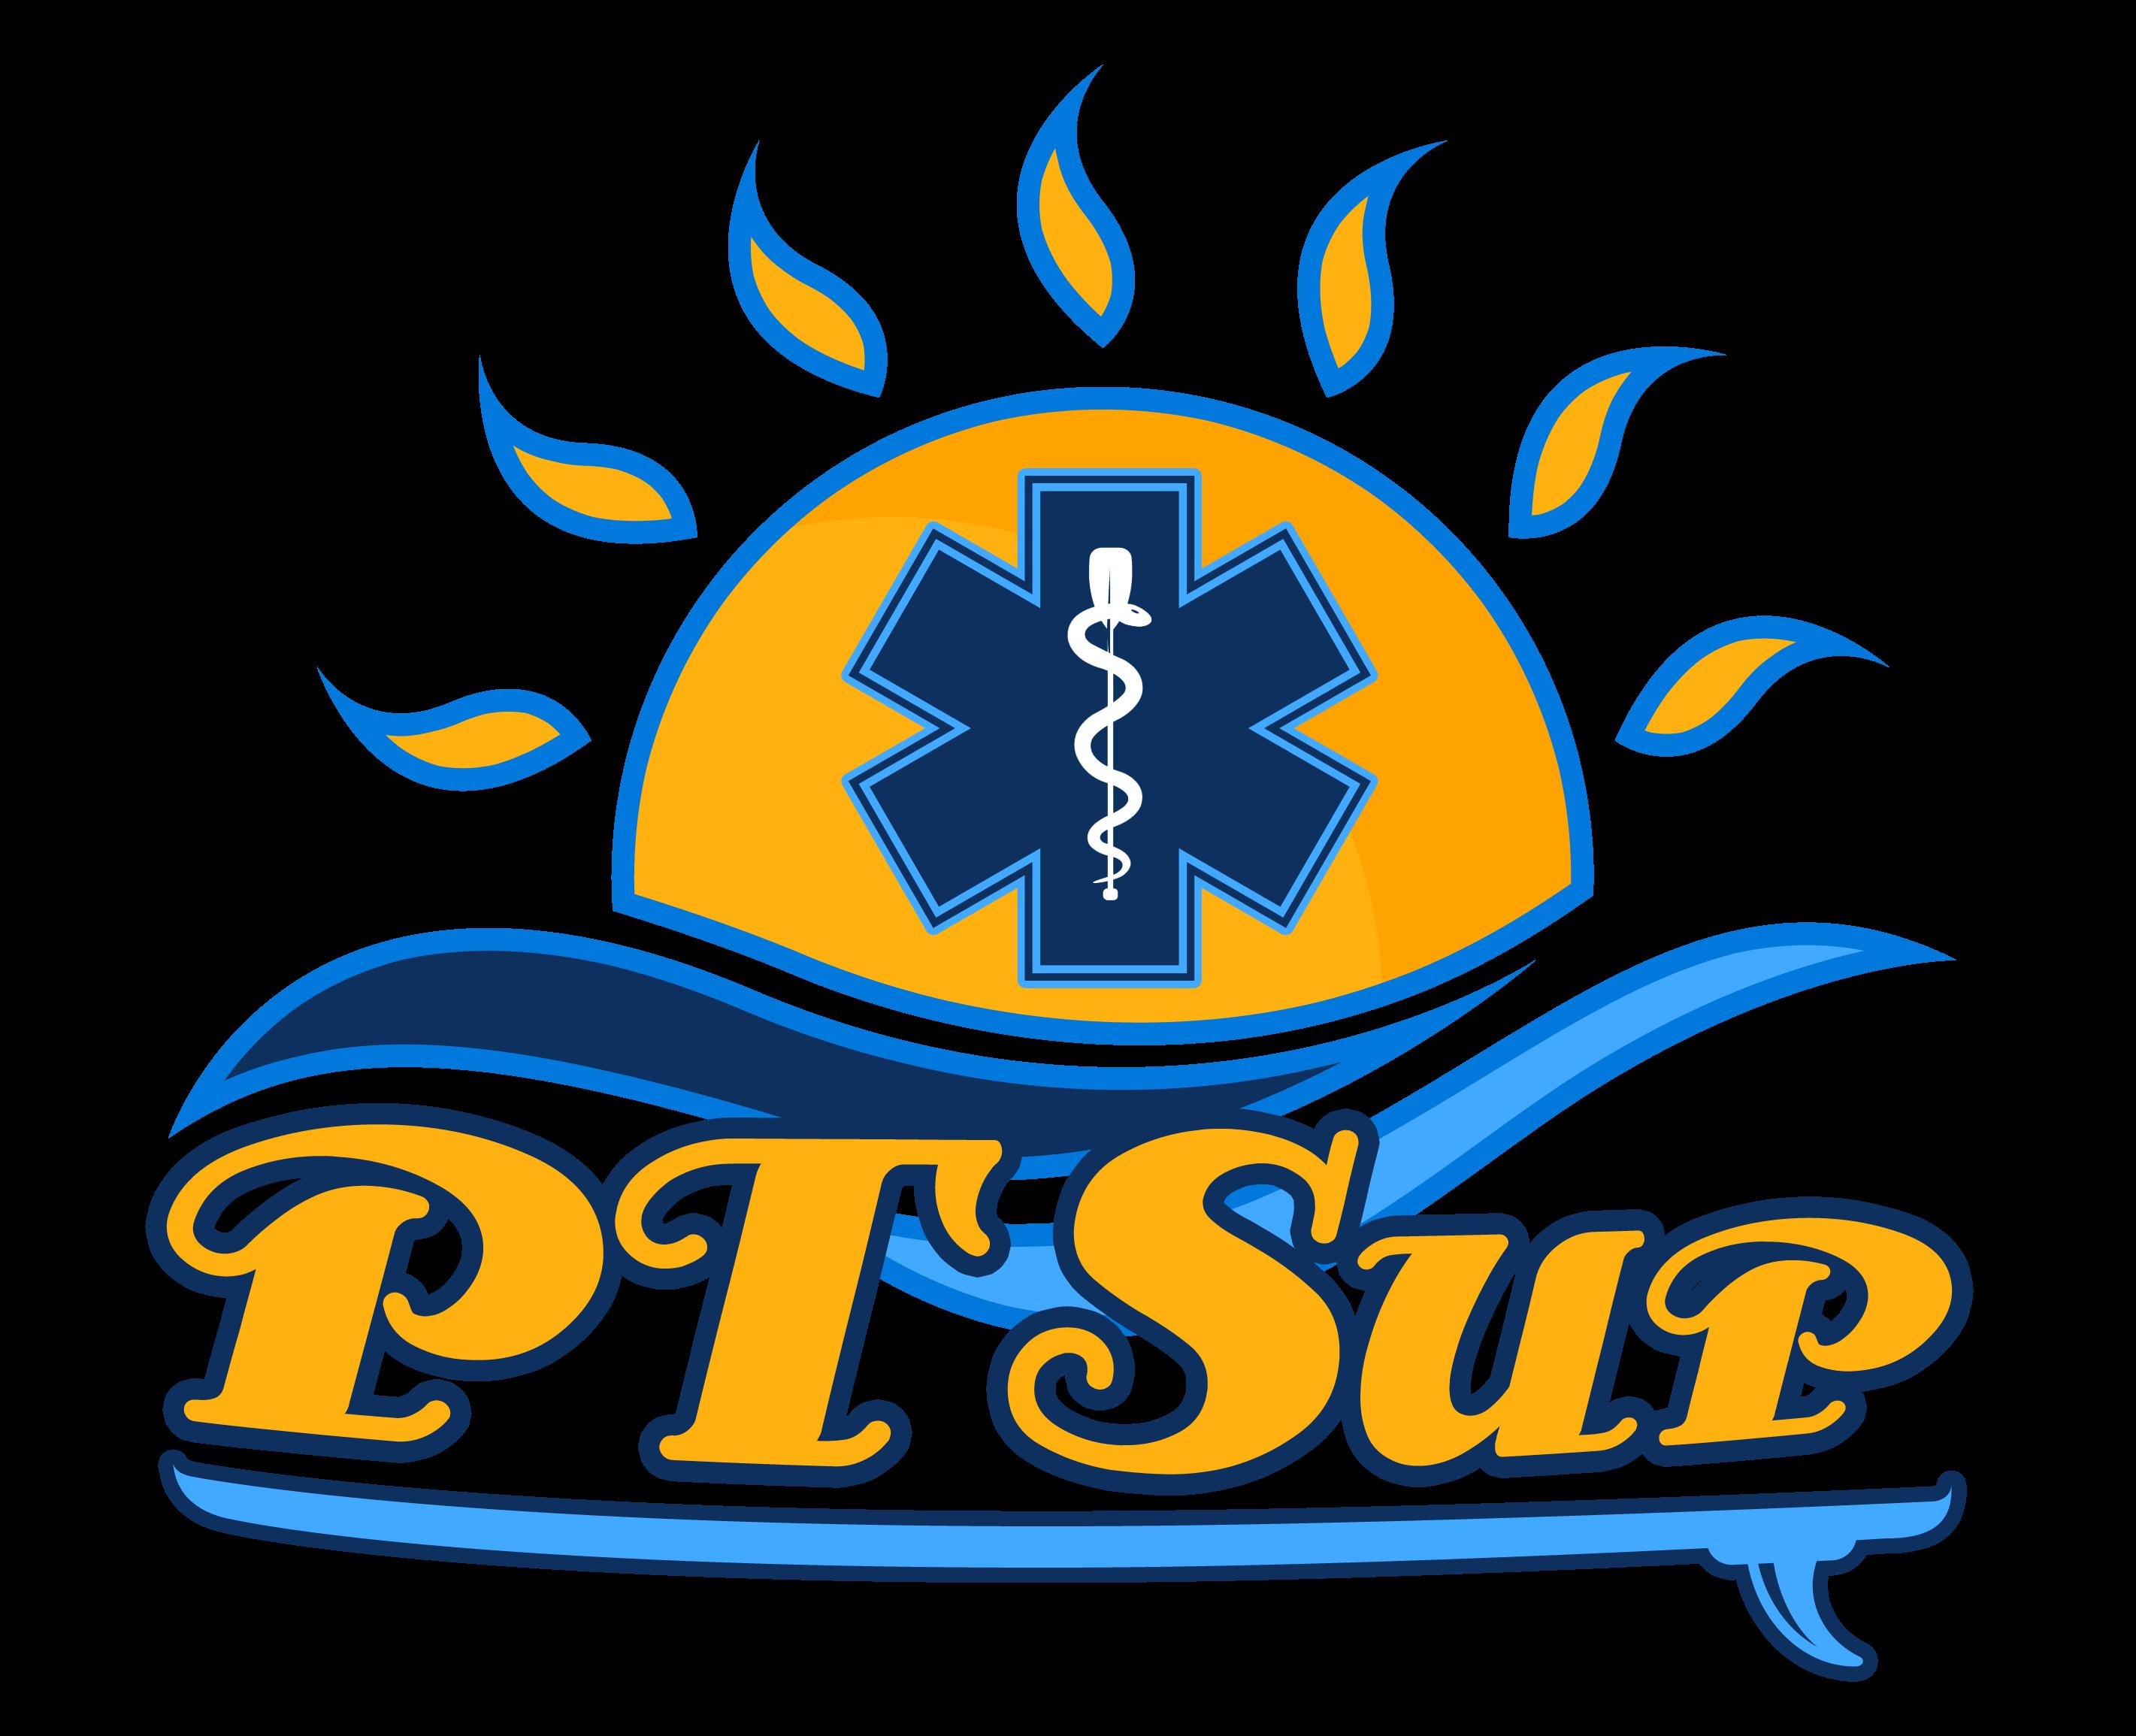 Ptsup paddle travis for. Pilgrims clipart ambassador